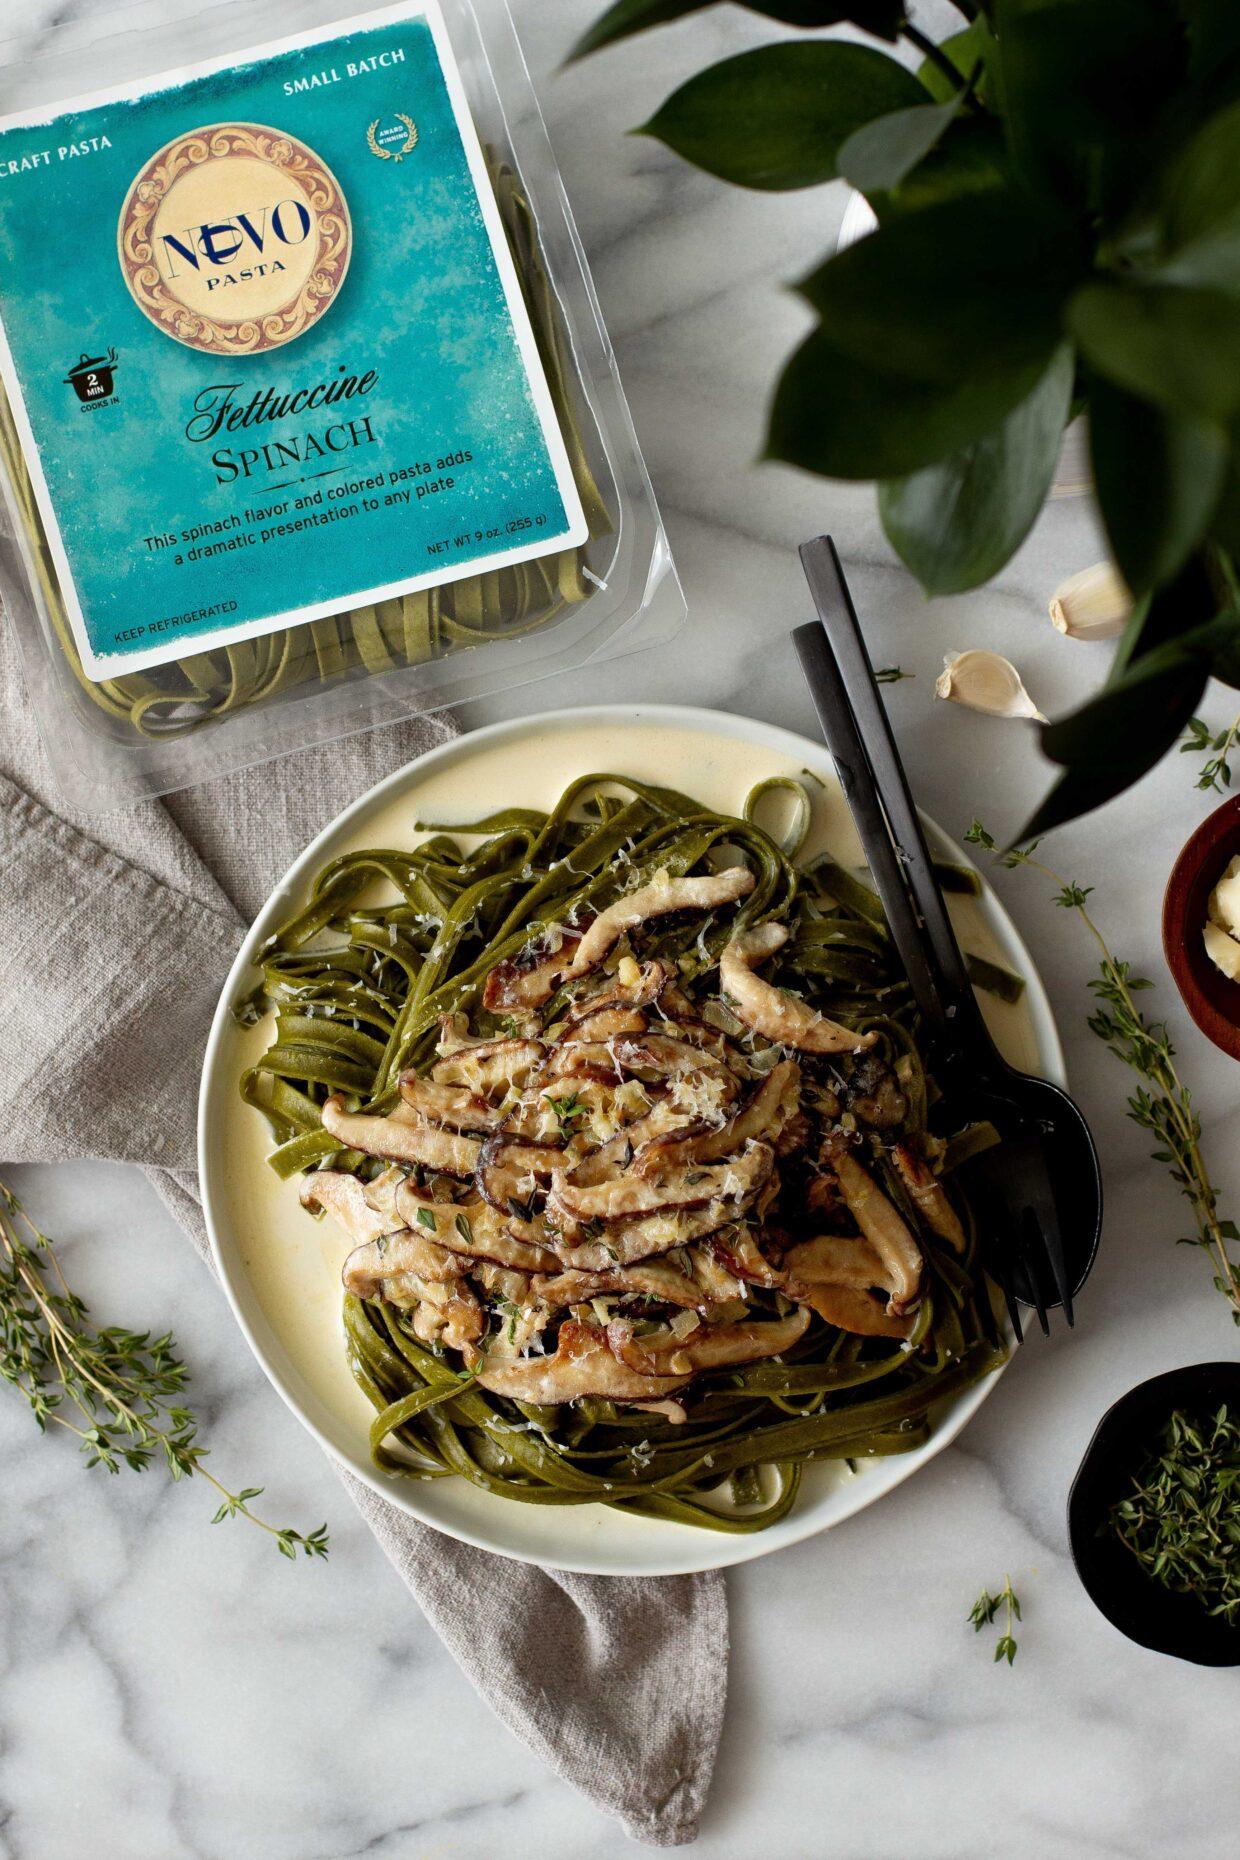 Spinach Fettuccine with Wild Mushroom Cream Sauce